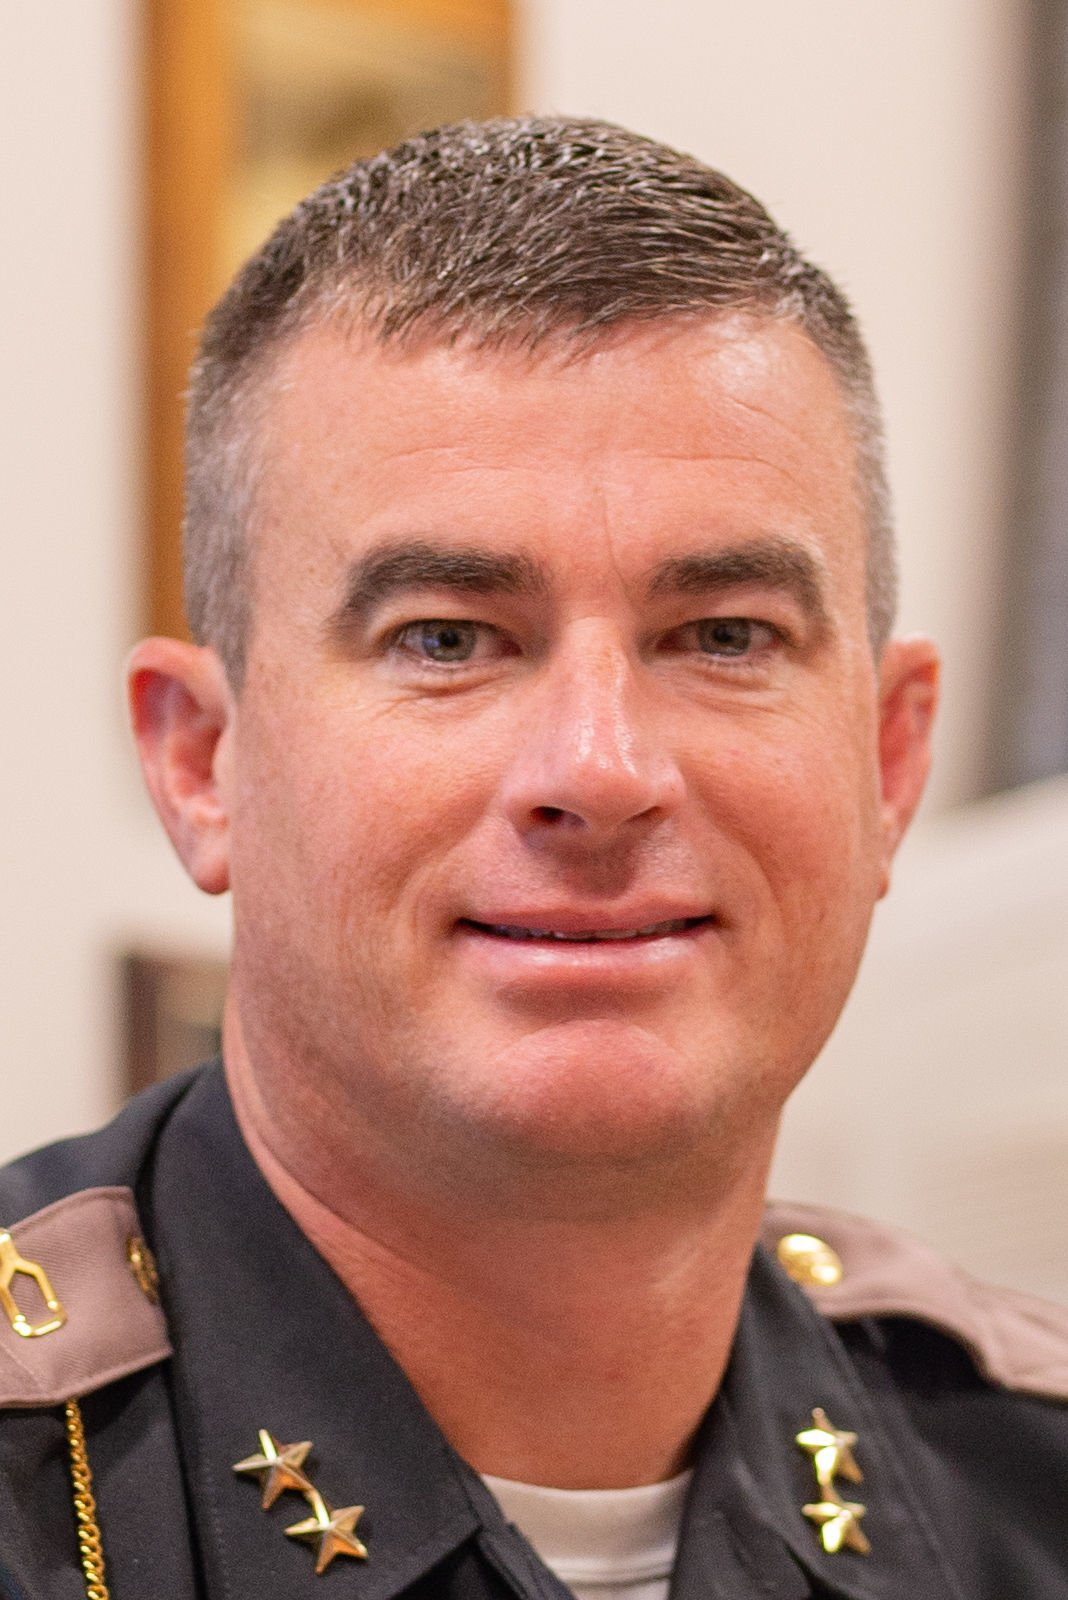 Local cops: Use of force, no-knock warrants rare